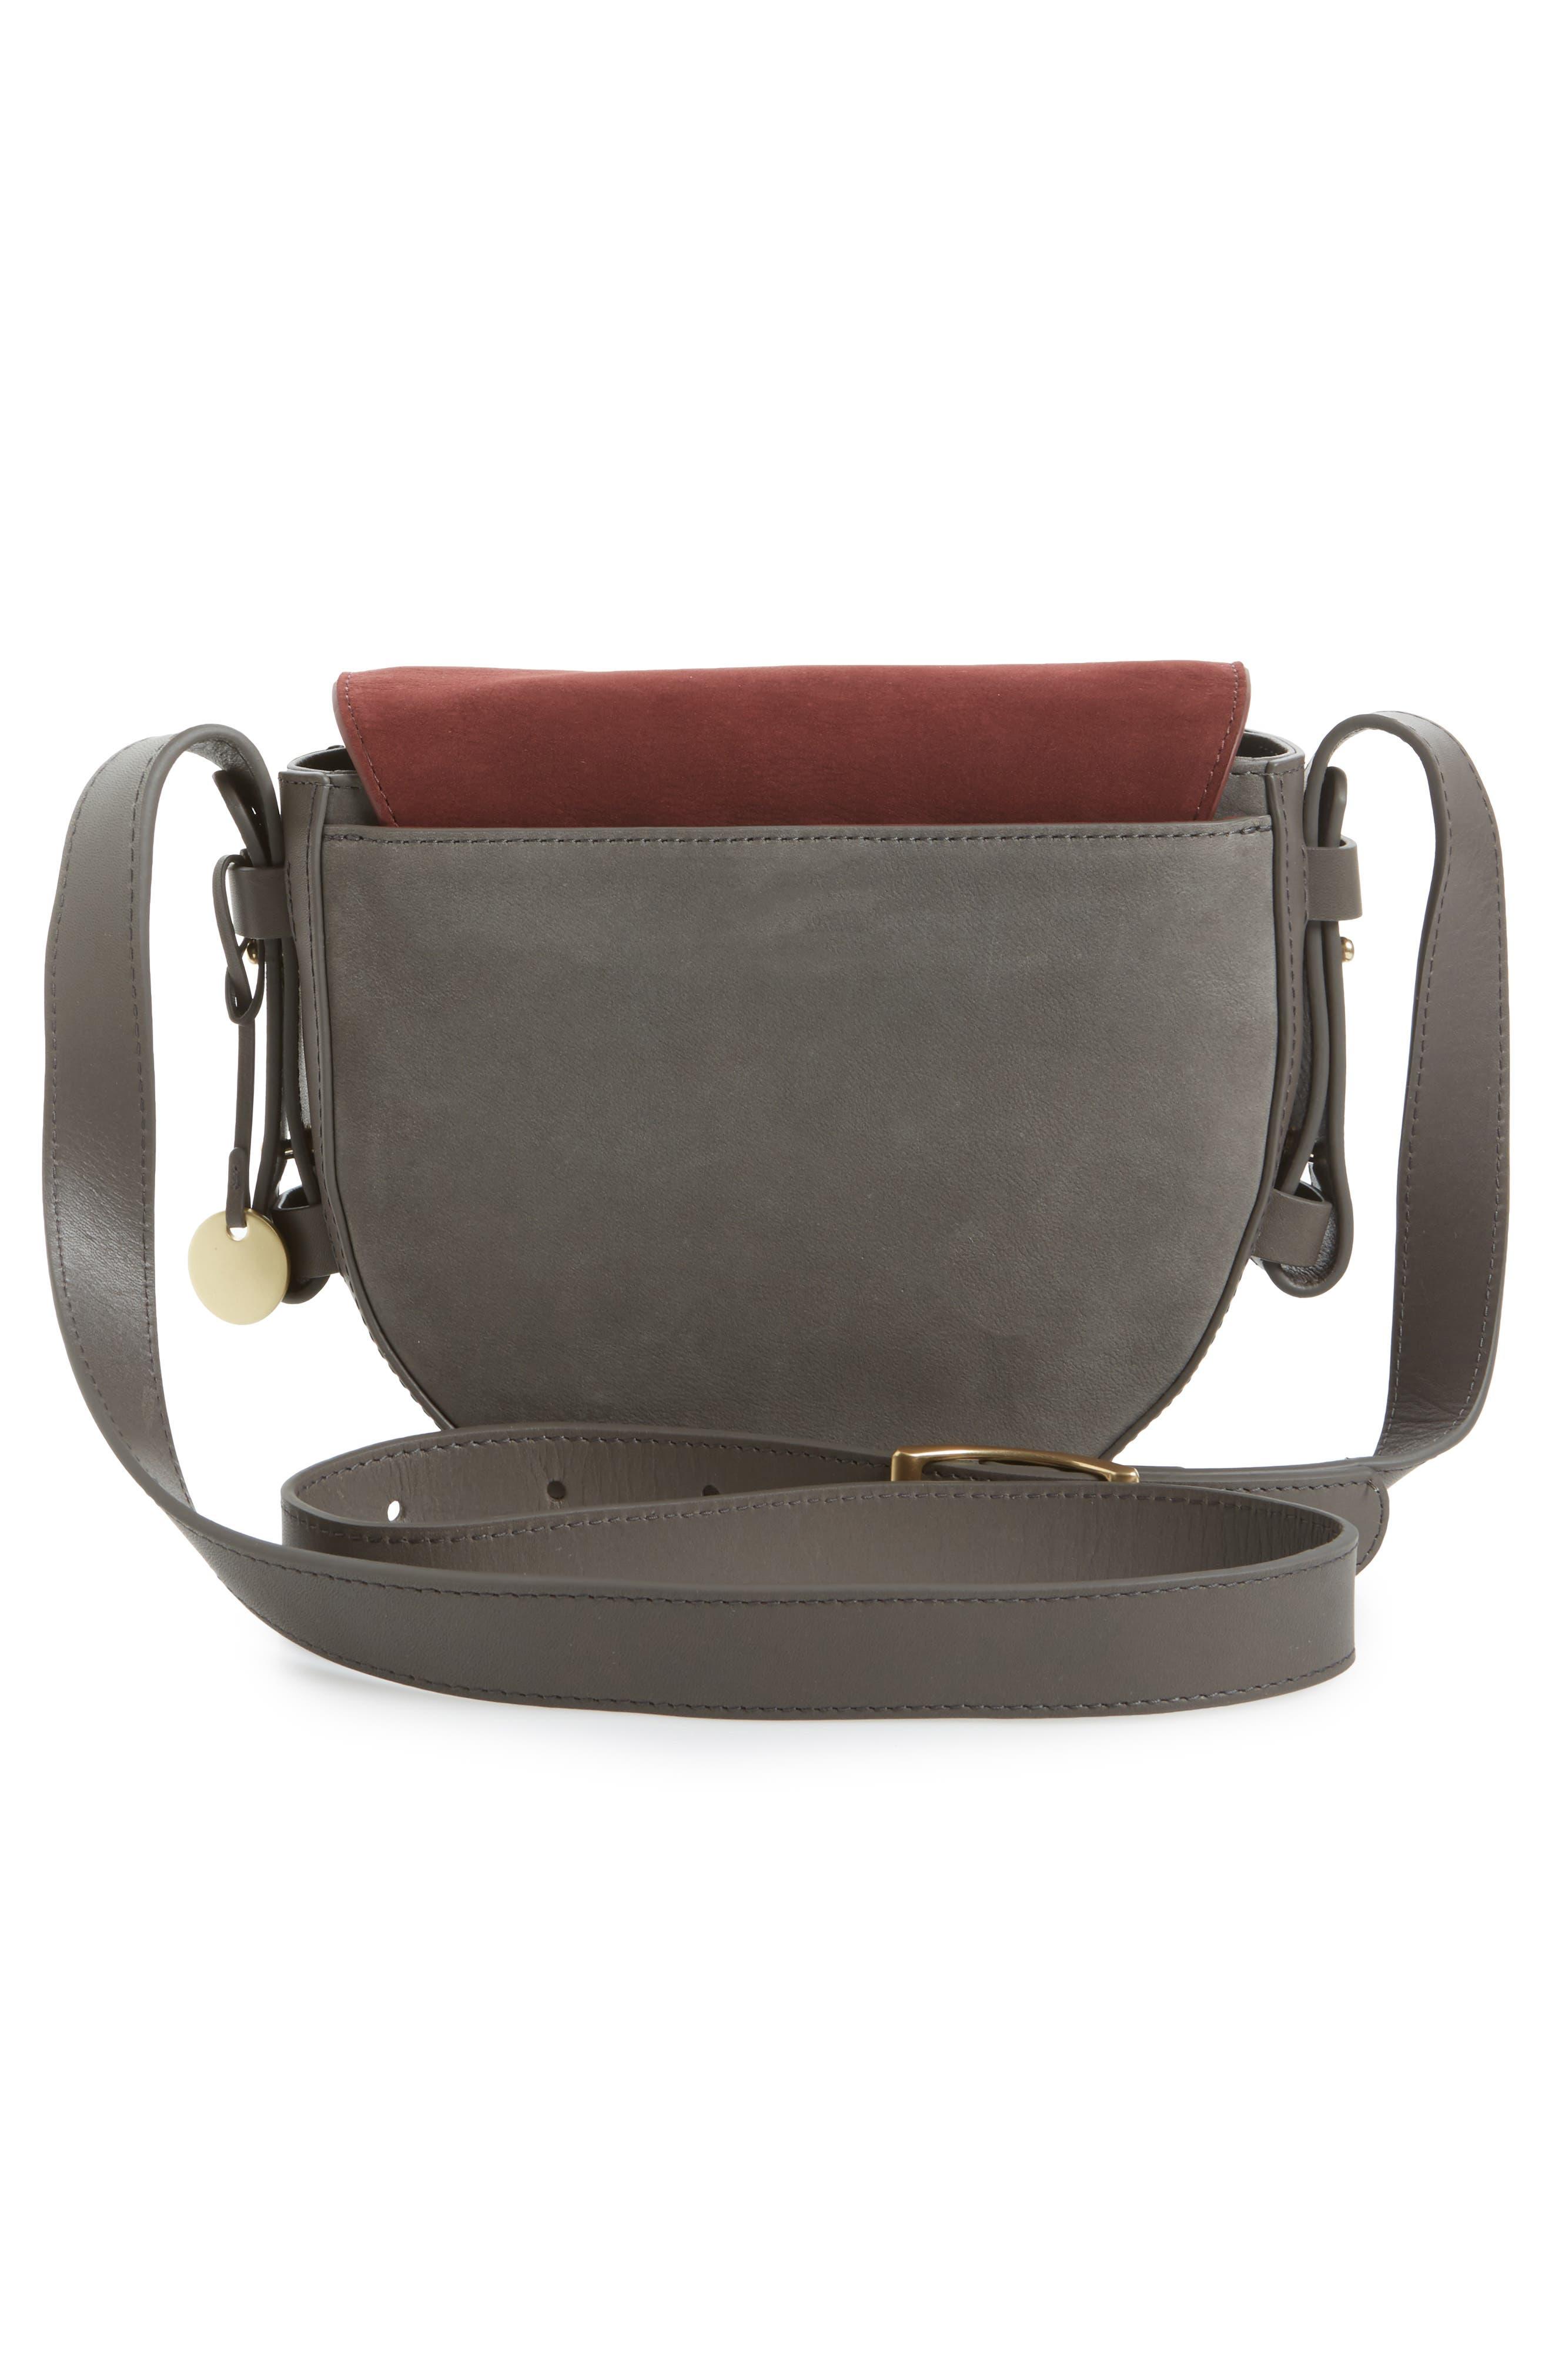 Lobelle Leather Saddle Bag,                             Alternate thumbnail 2, color,                             Pewter